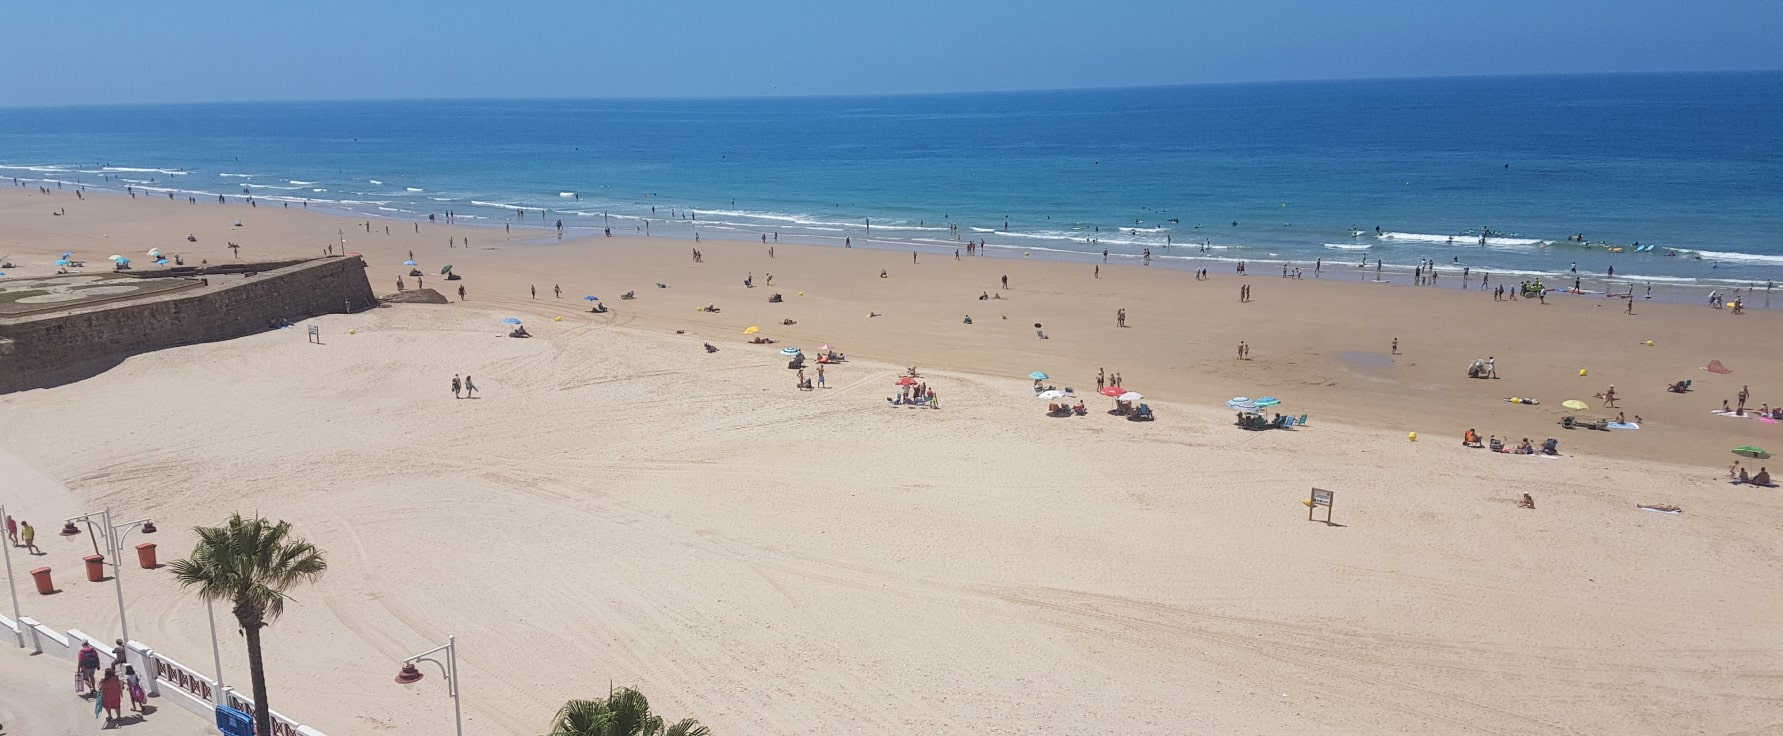 Playa Victoria, Cádiz